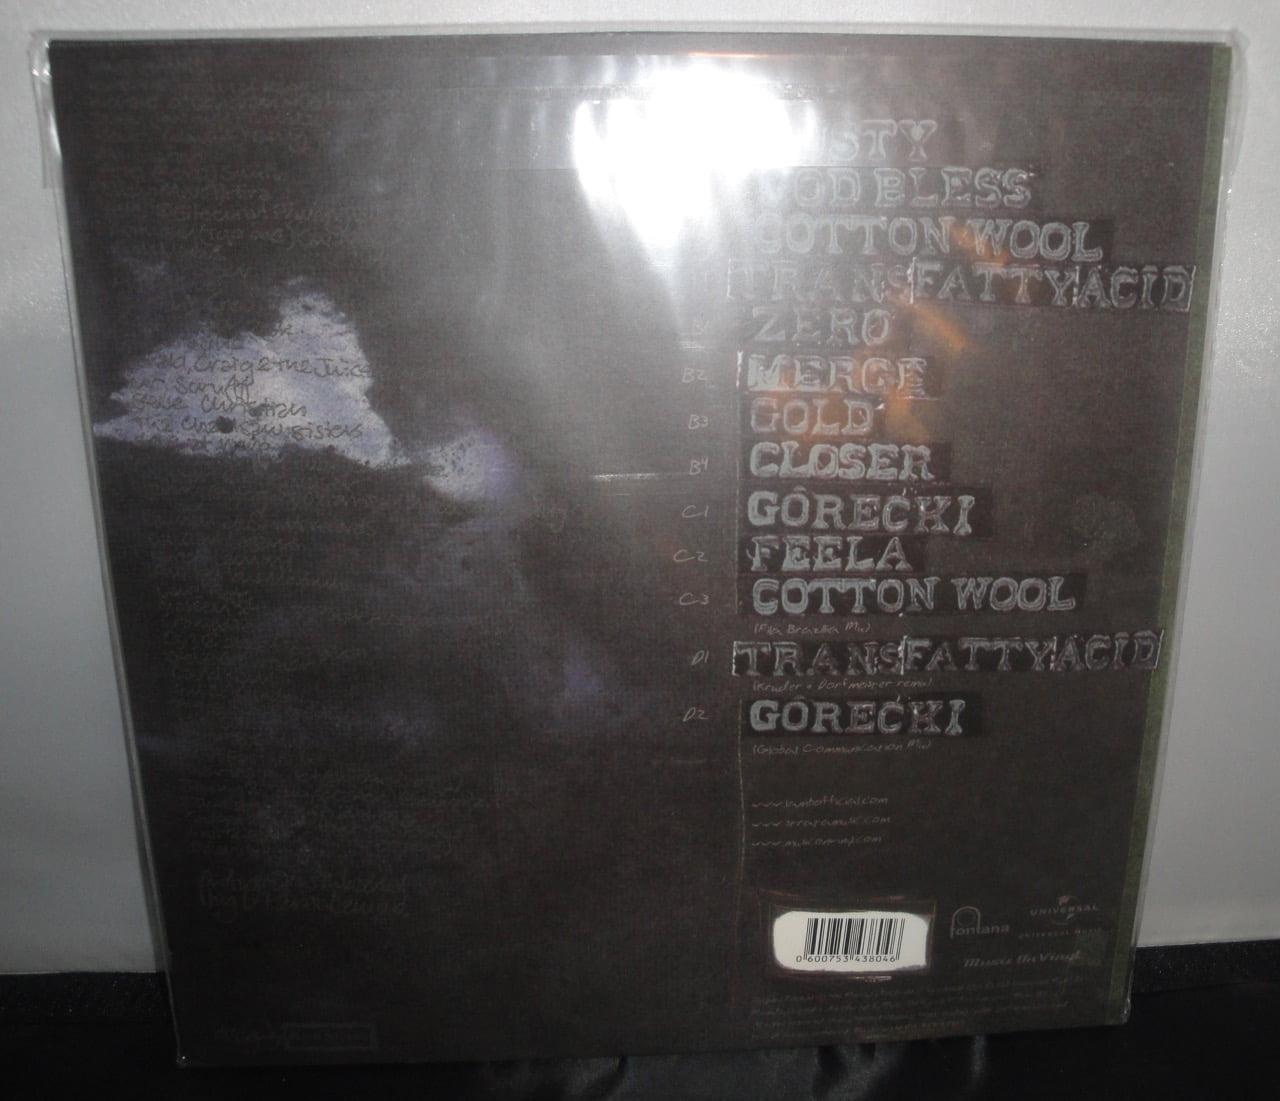 Lamb - Lamb - 2XLP 21st Anniversary Edition, Gold Vinyl, 2017